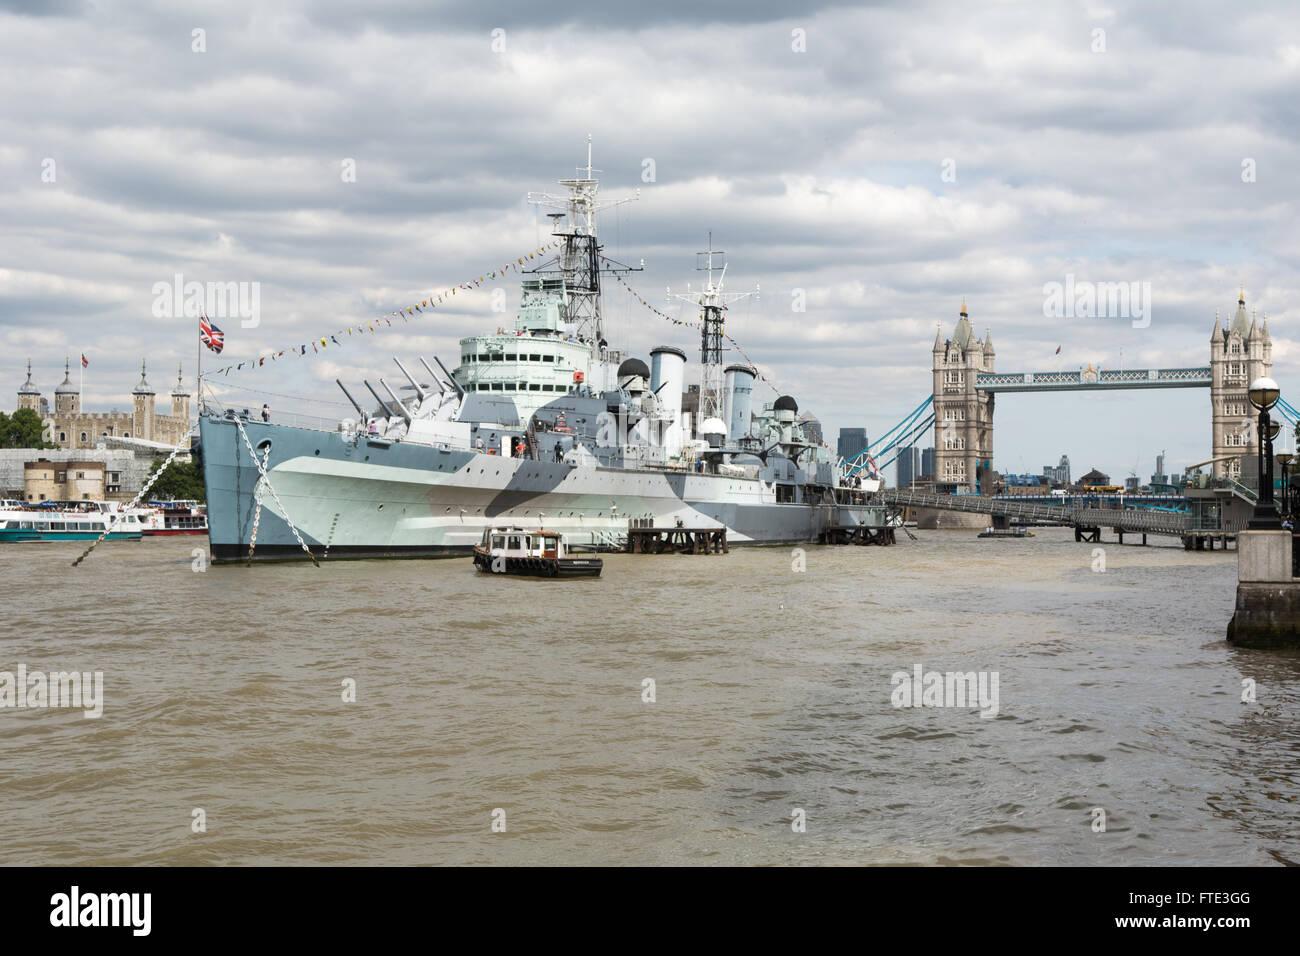 HMS Belfast moored on Thames - Stock Image